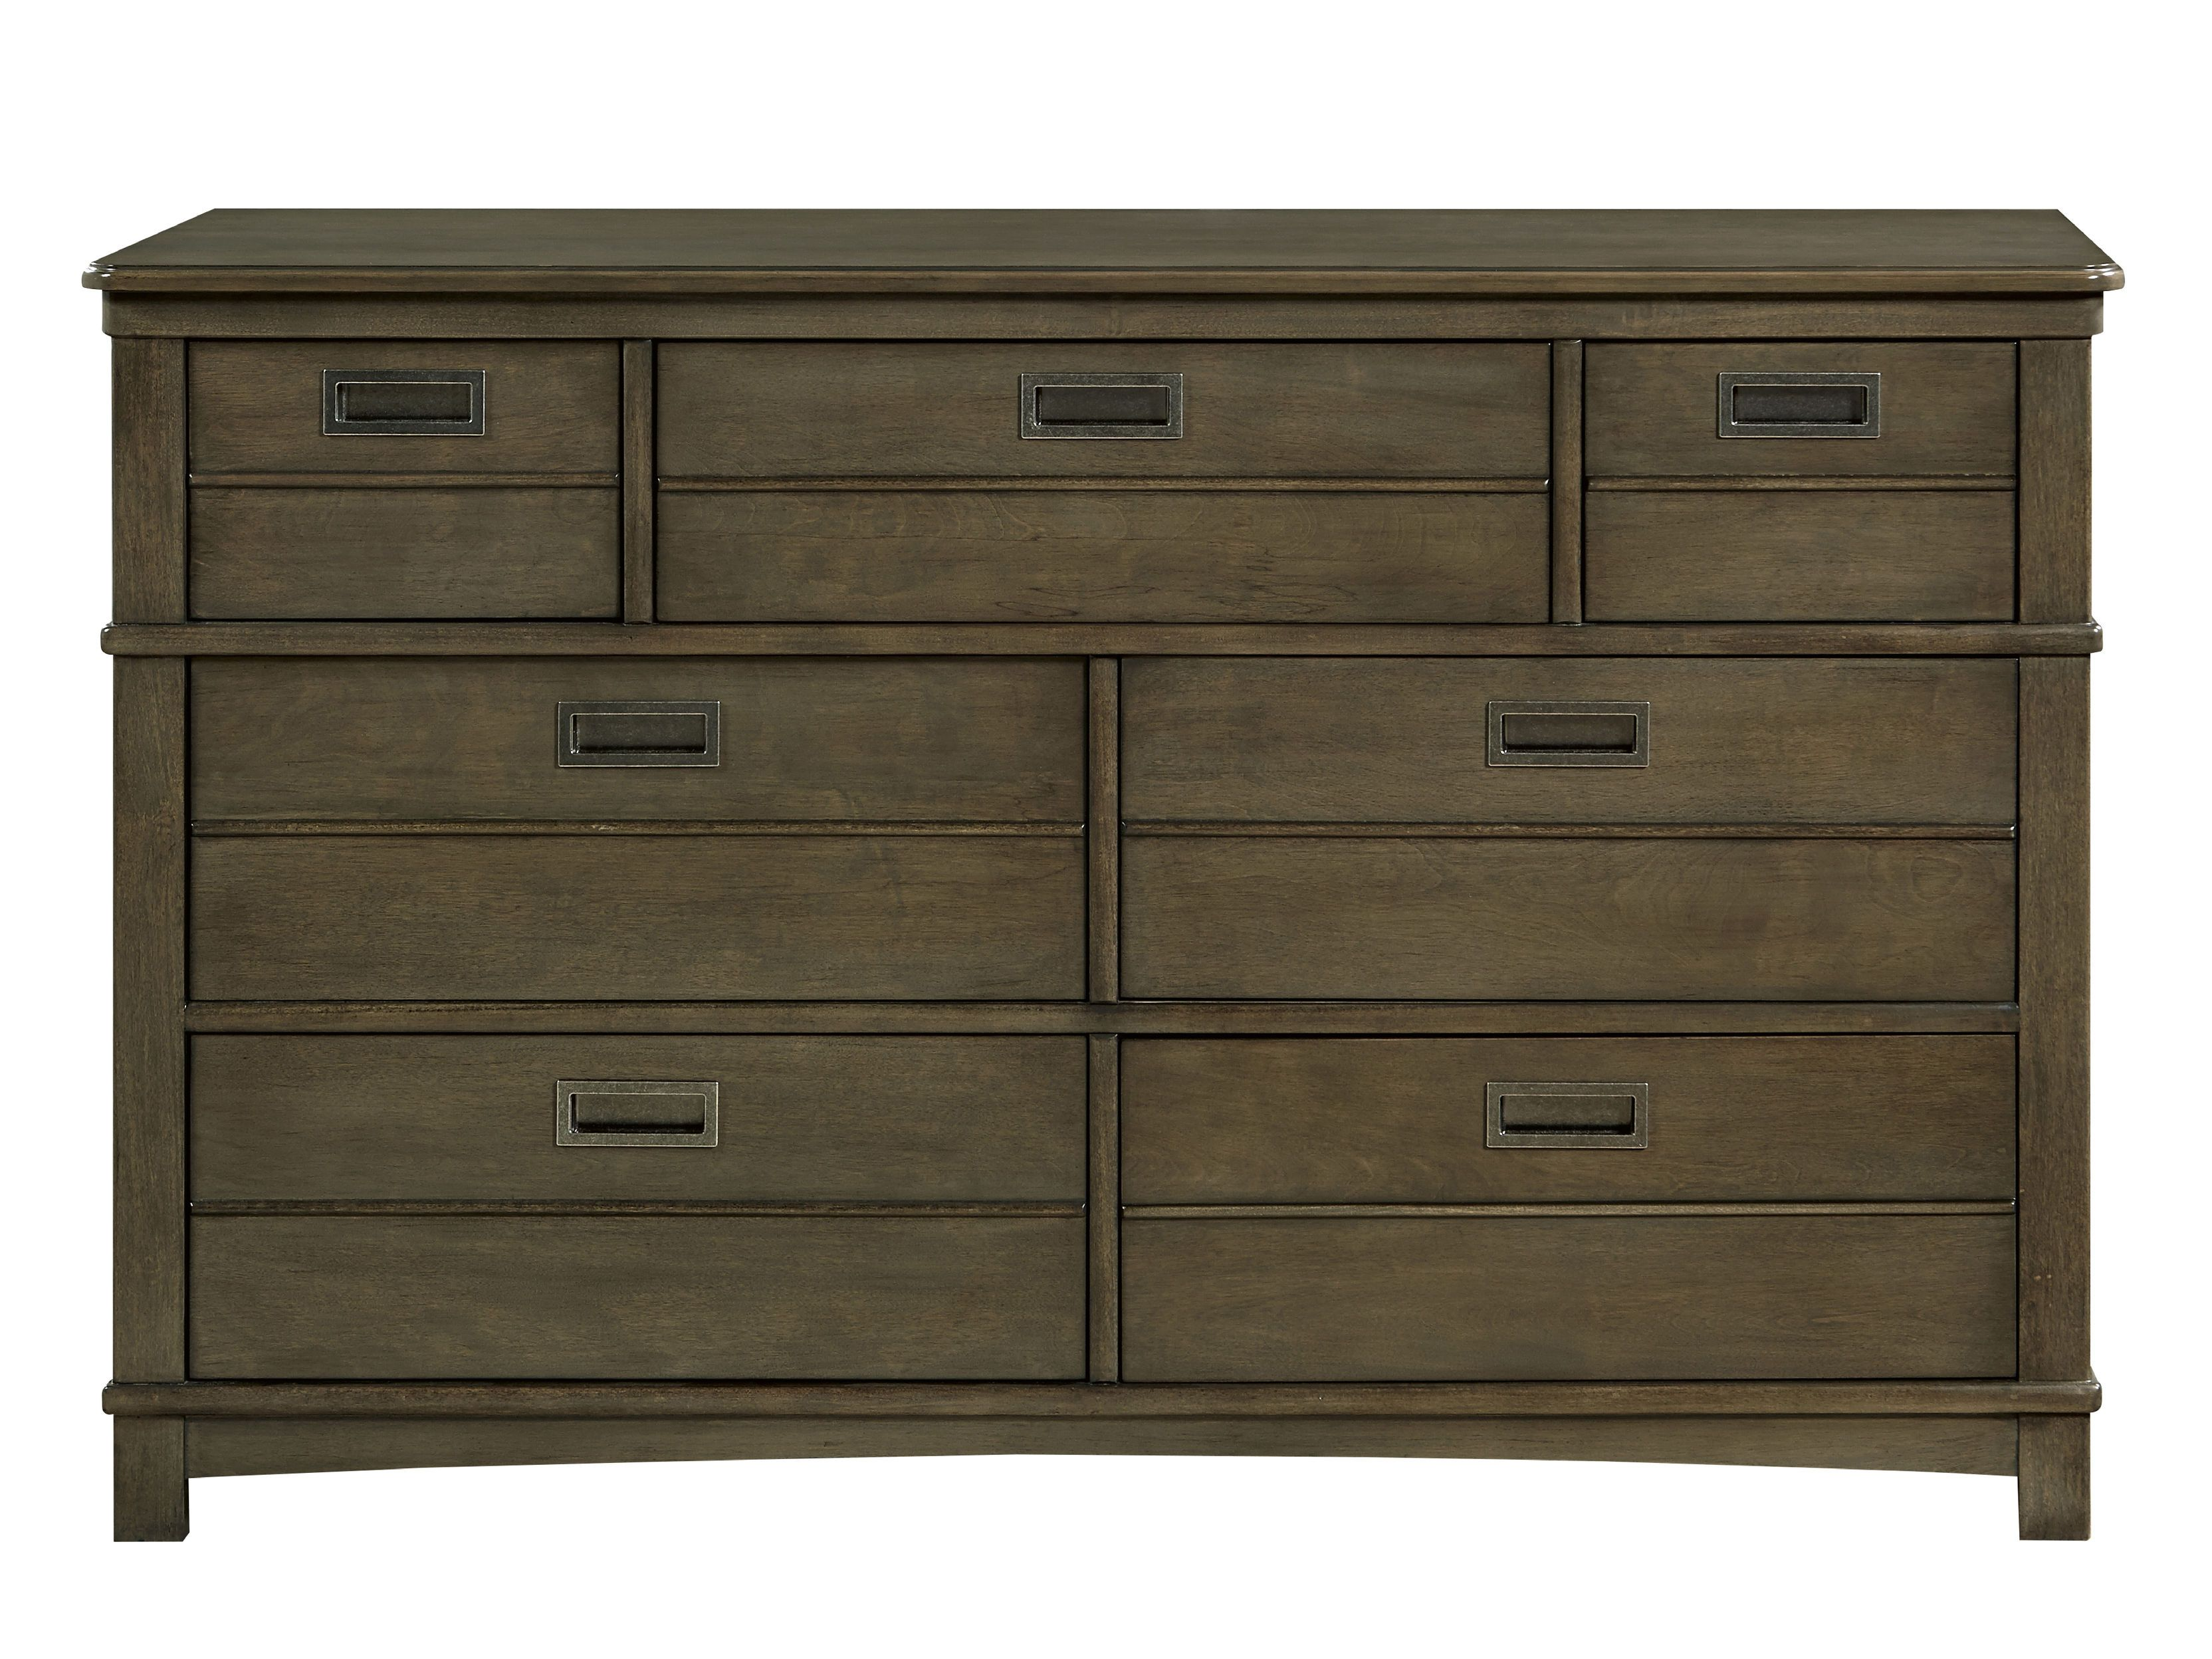 Varsity Dresser ST468631 Furniture, Dresser drawers